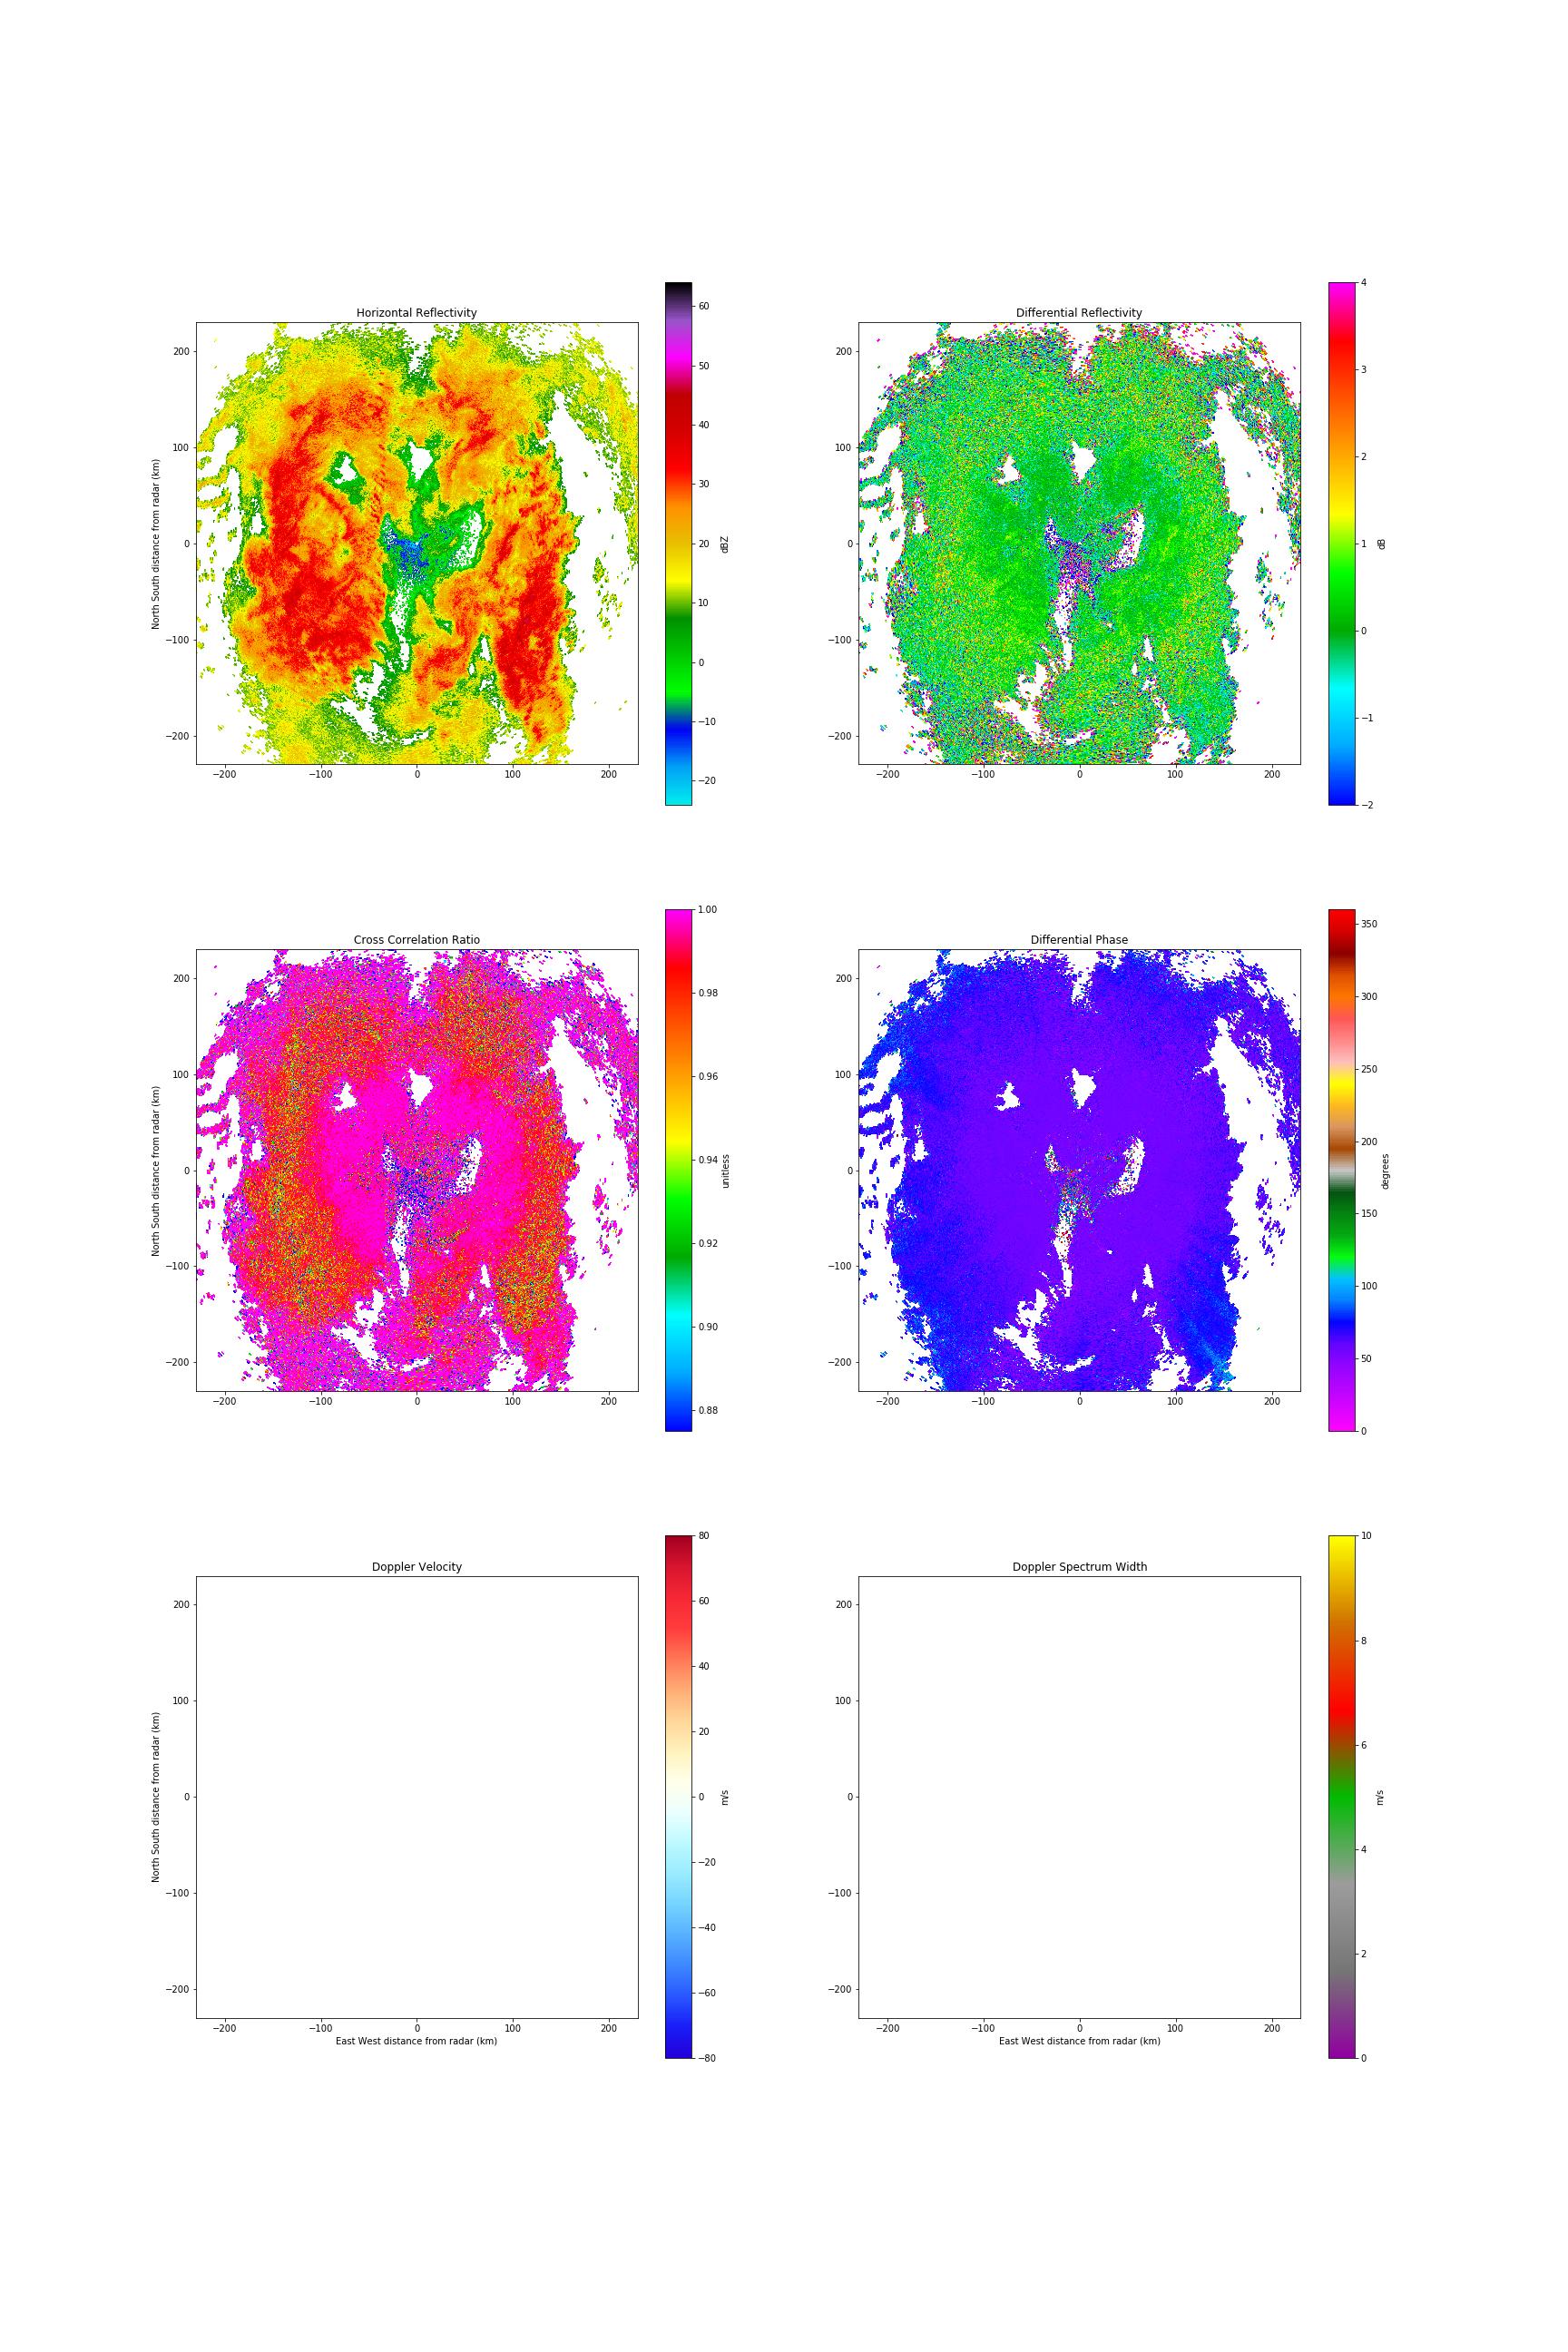 Problem Plotting NEXRAD Velocity and Spectrum Width · Issue